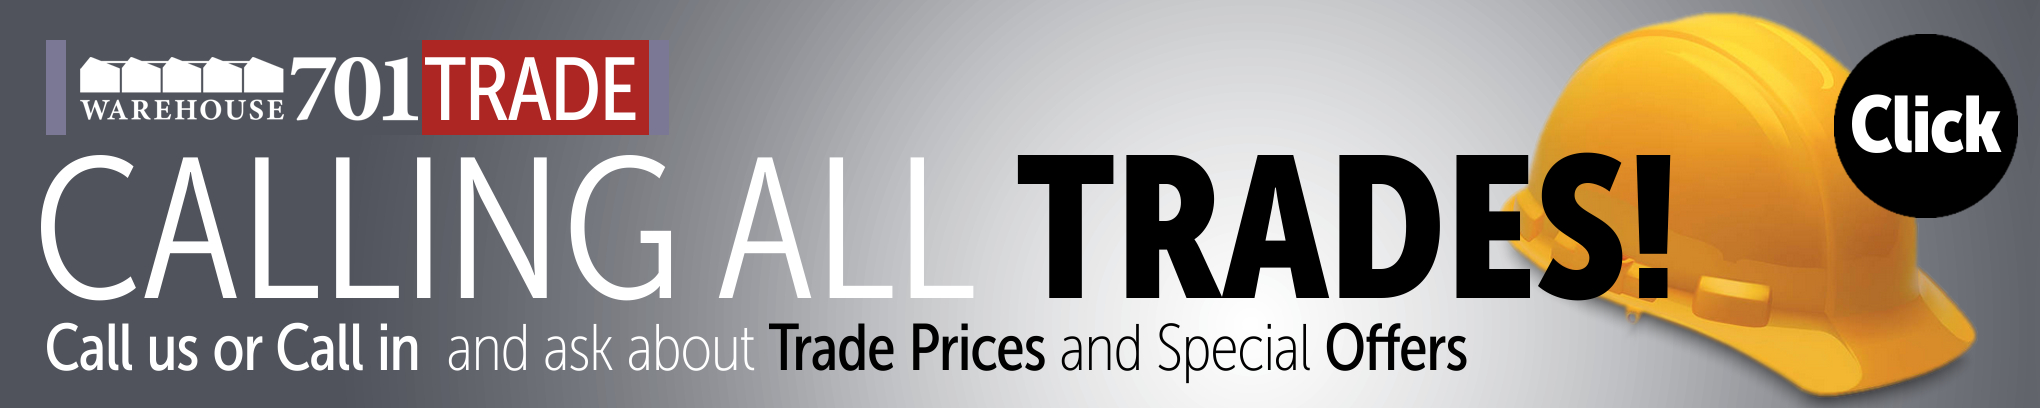 trade enquiry image